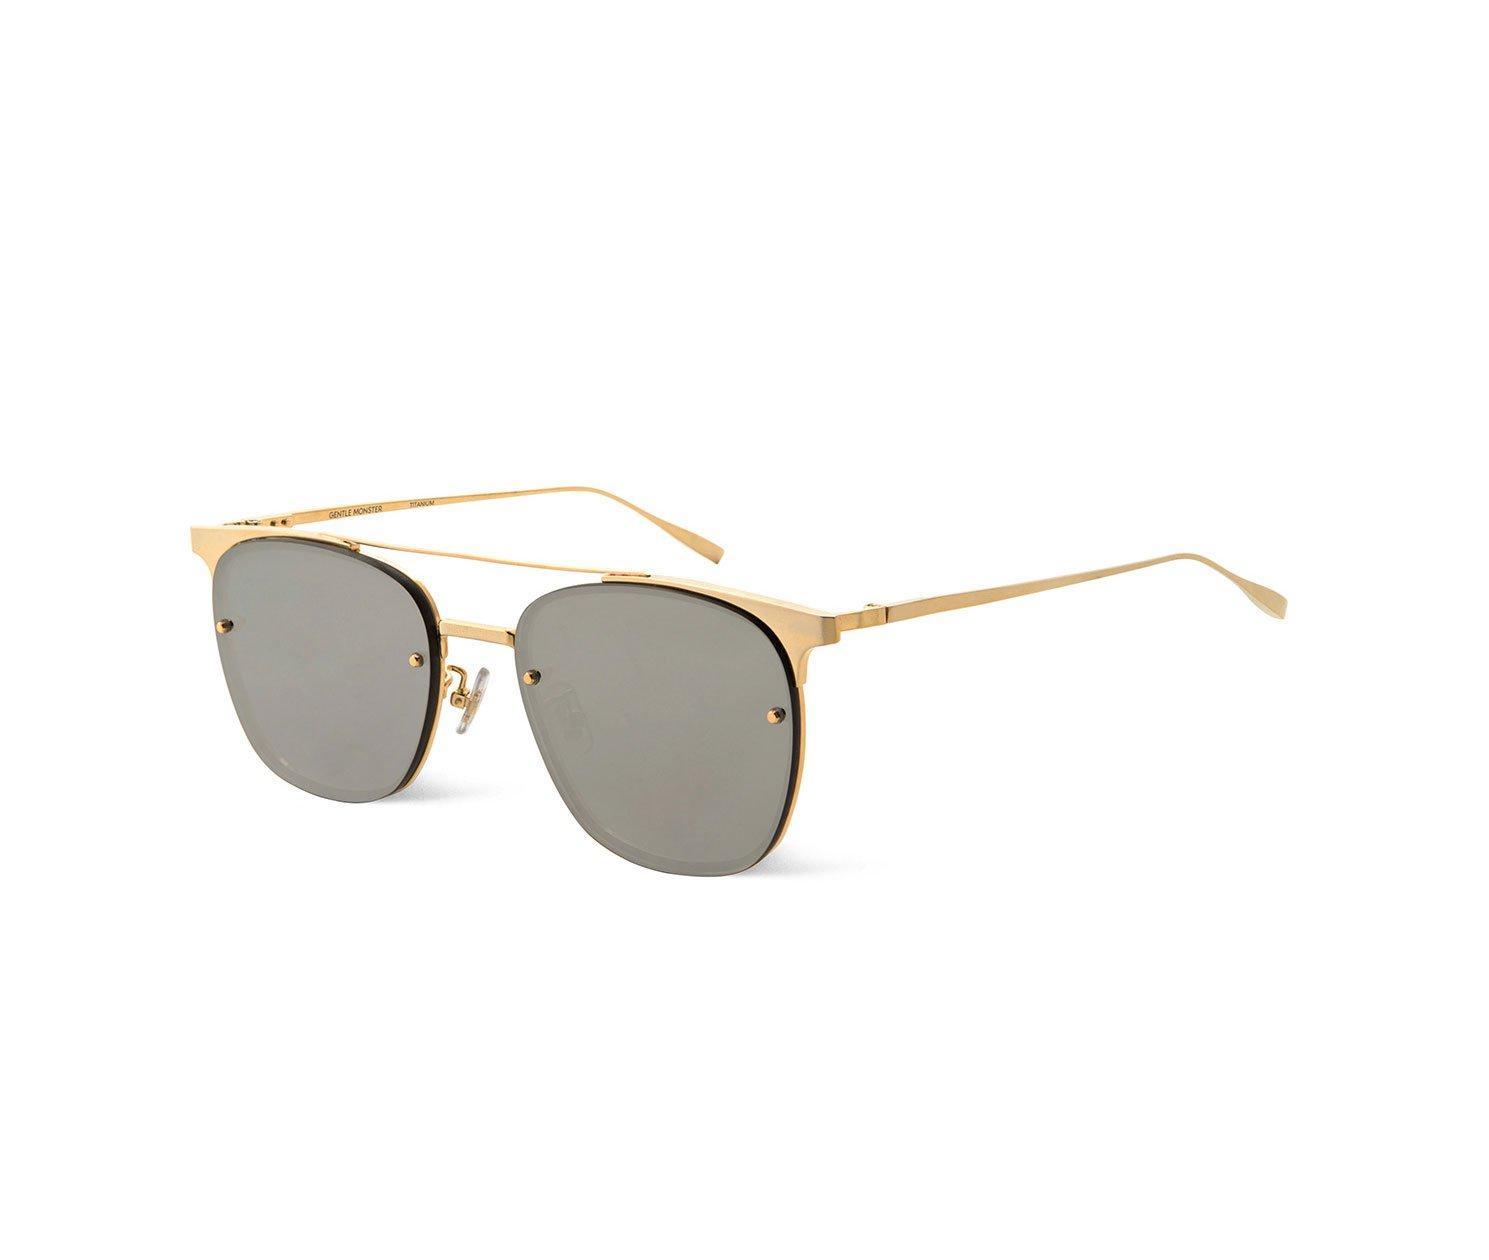 Sunglasses Gentle Monster Fame 03m Unisex Gold Square